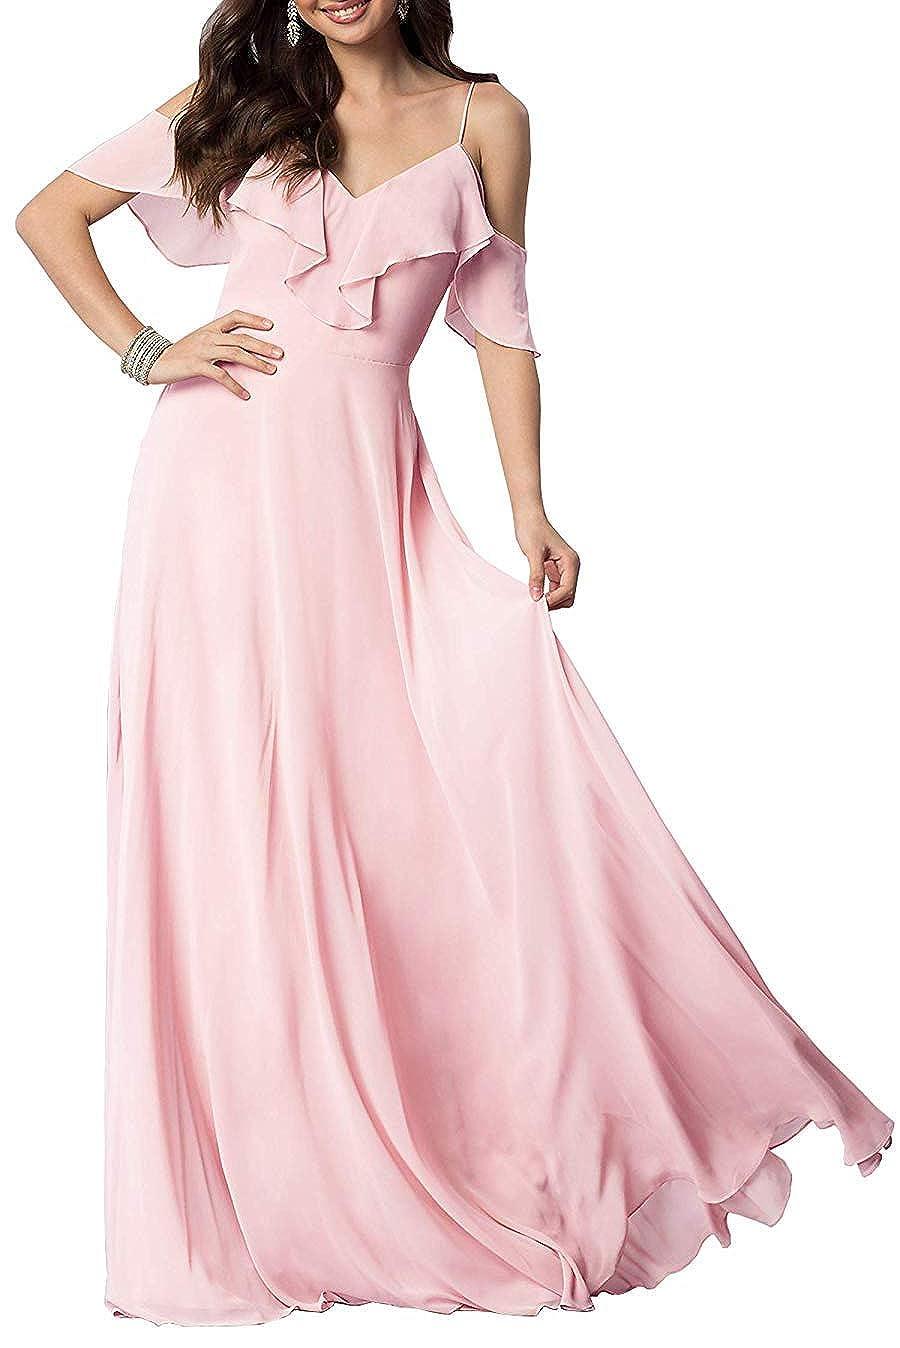 blueshA FeiYueXinXing VNeck Ruffled Spaghetti Strap Prom Dresses Long Formal Evening Gown